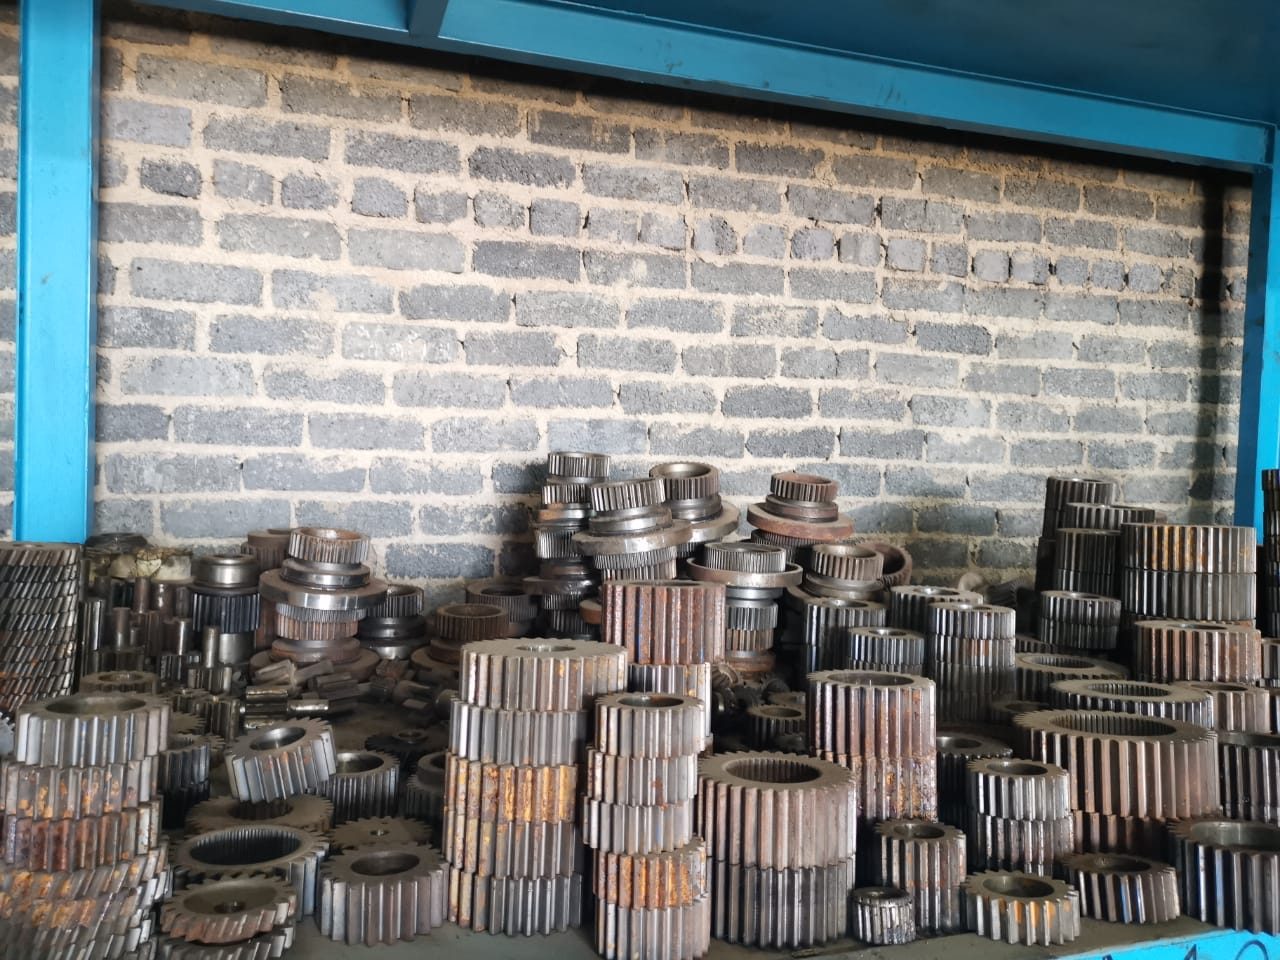 Komatsu gears and engine parts